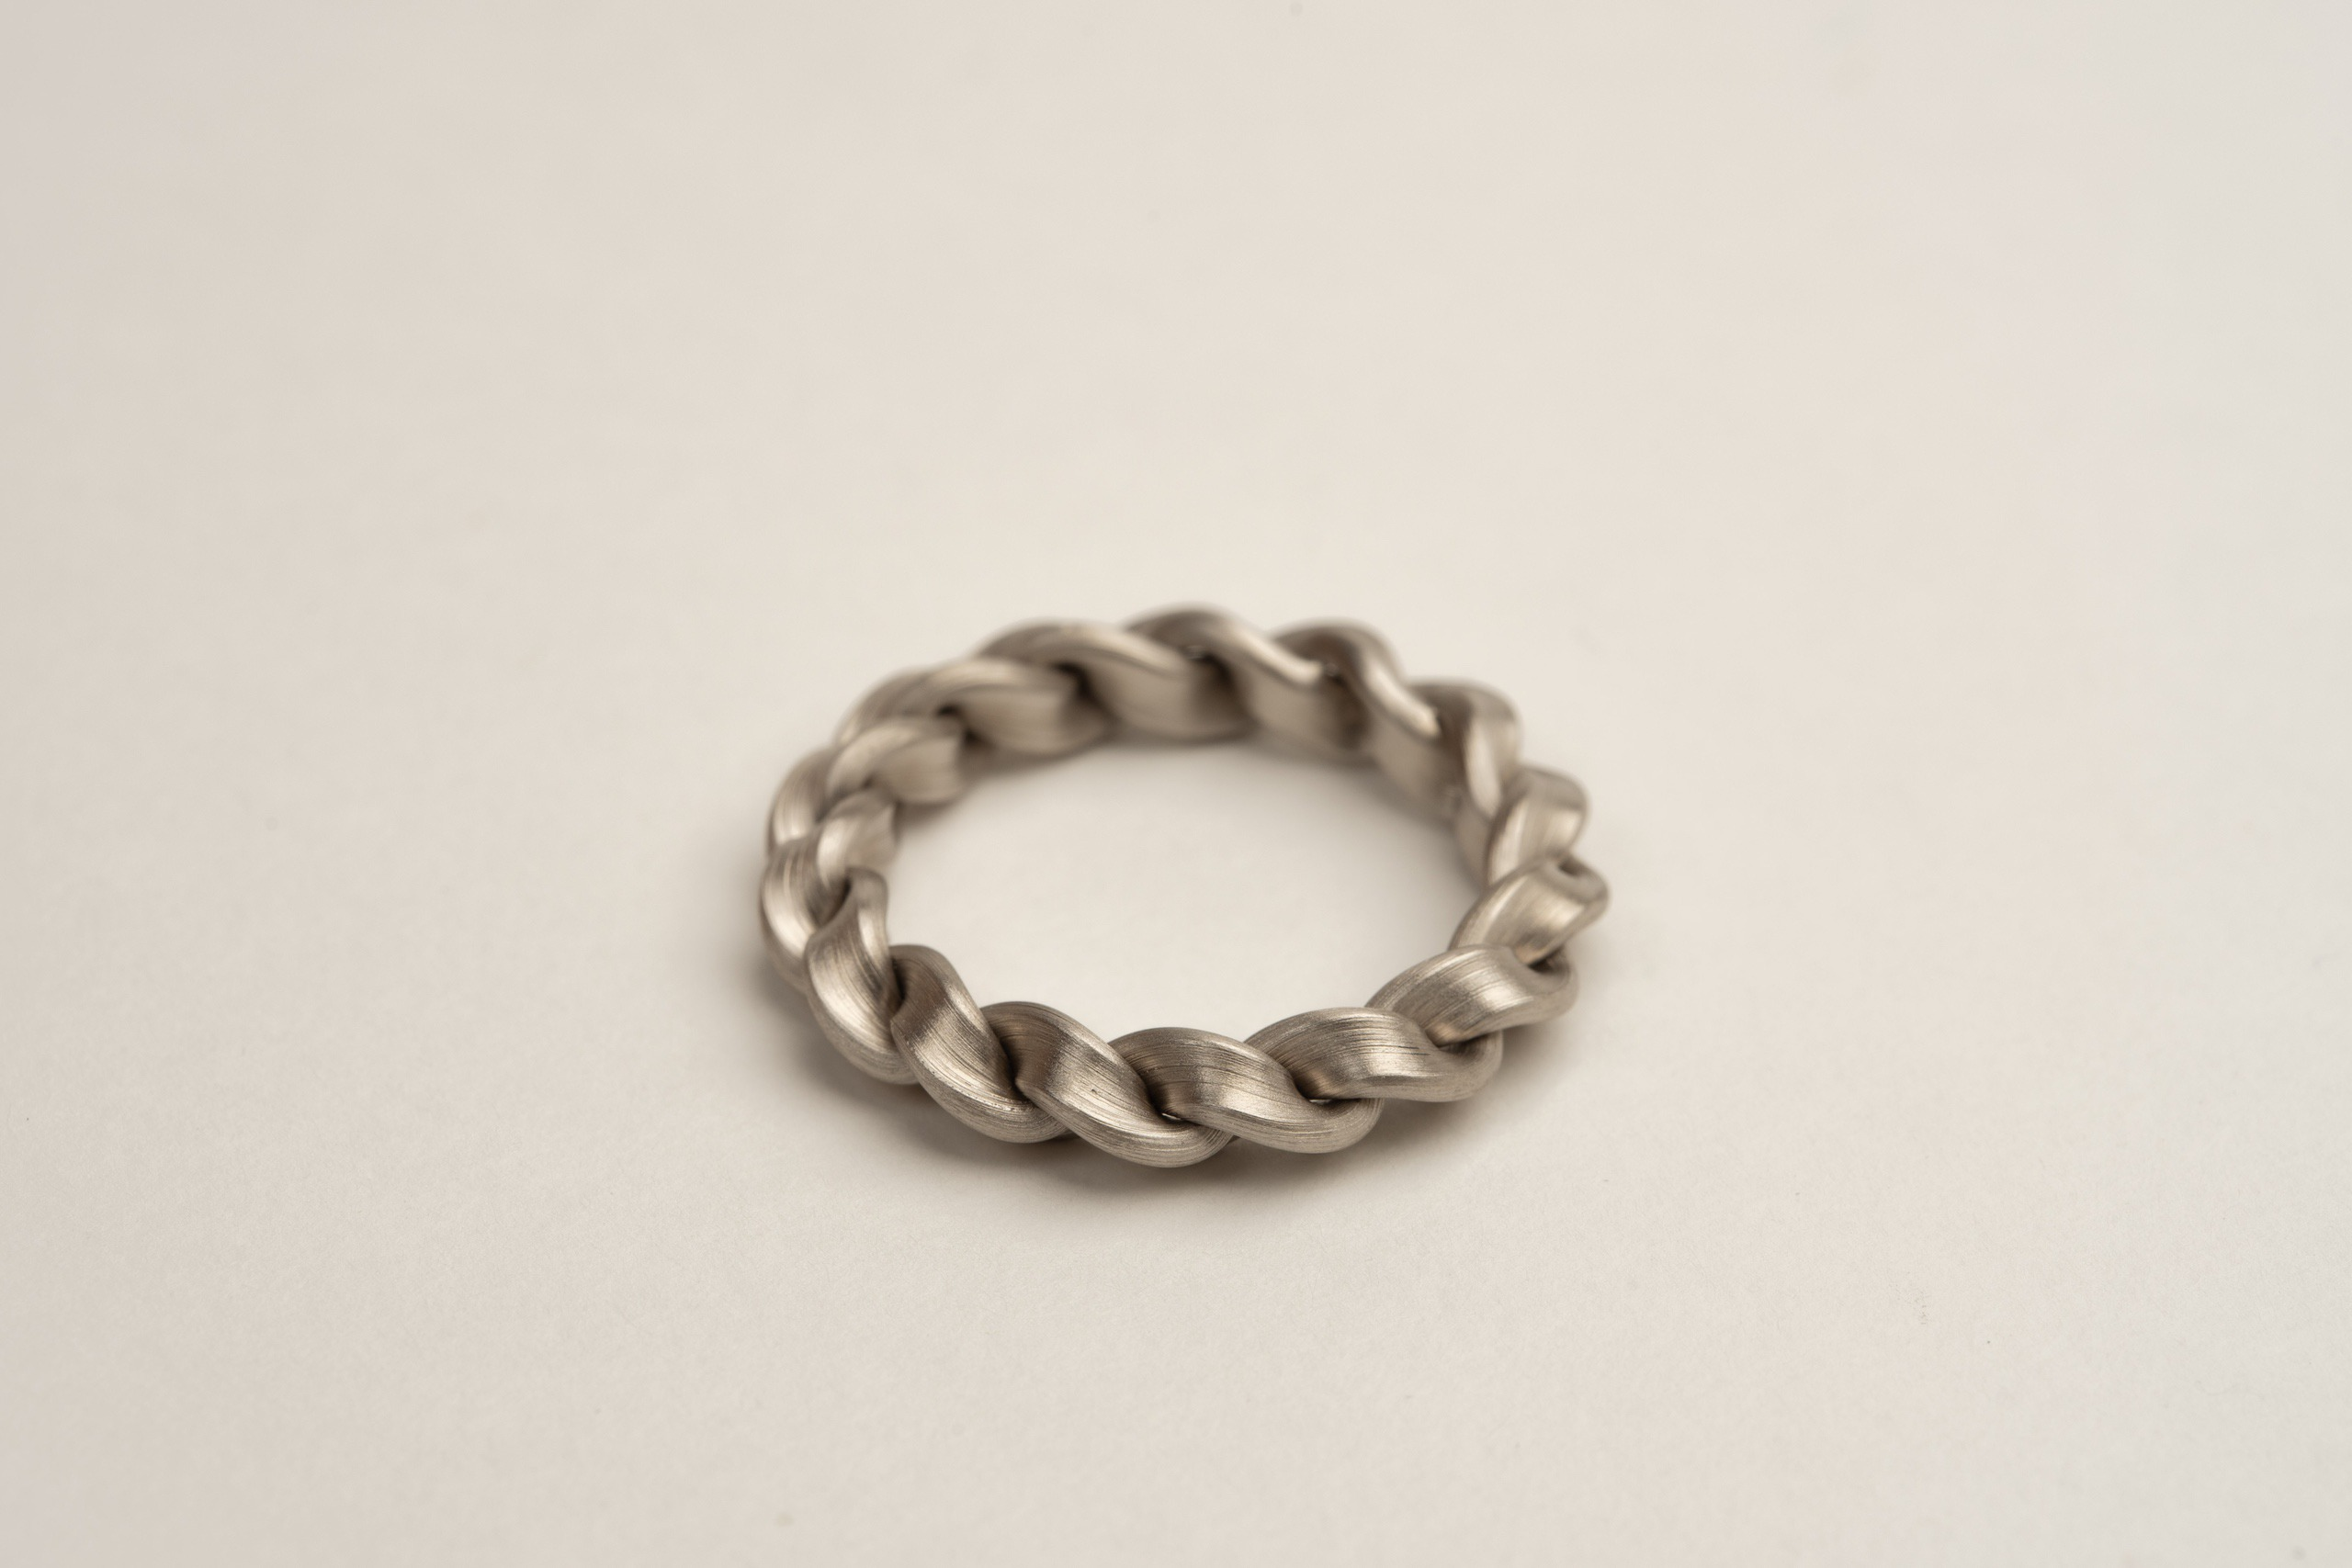 43-viking-leen-heyne0002